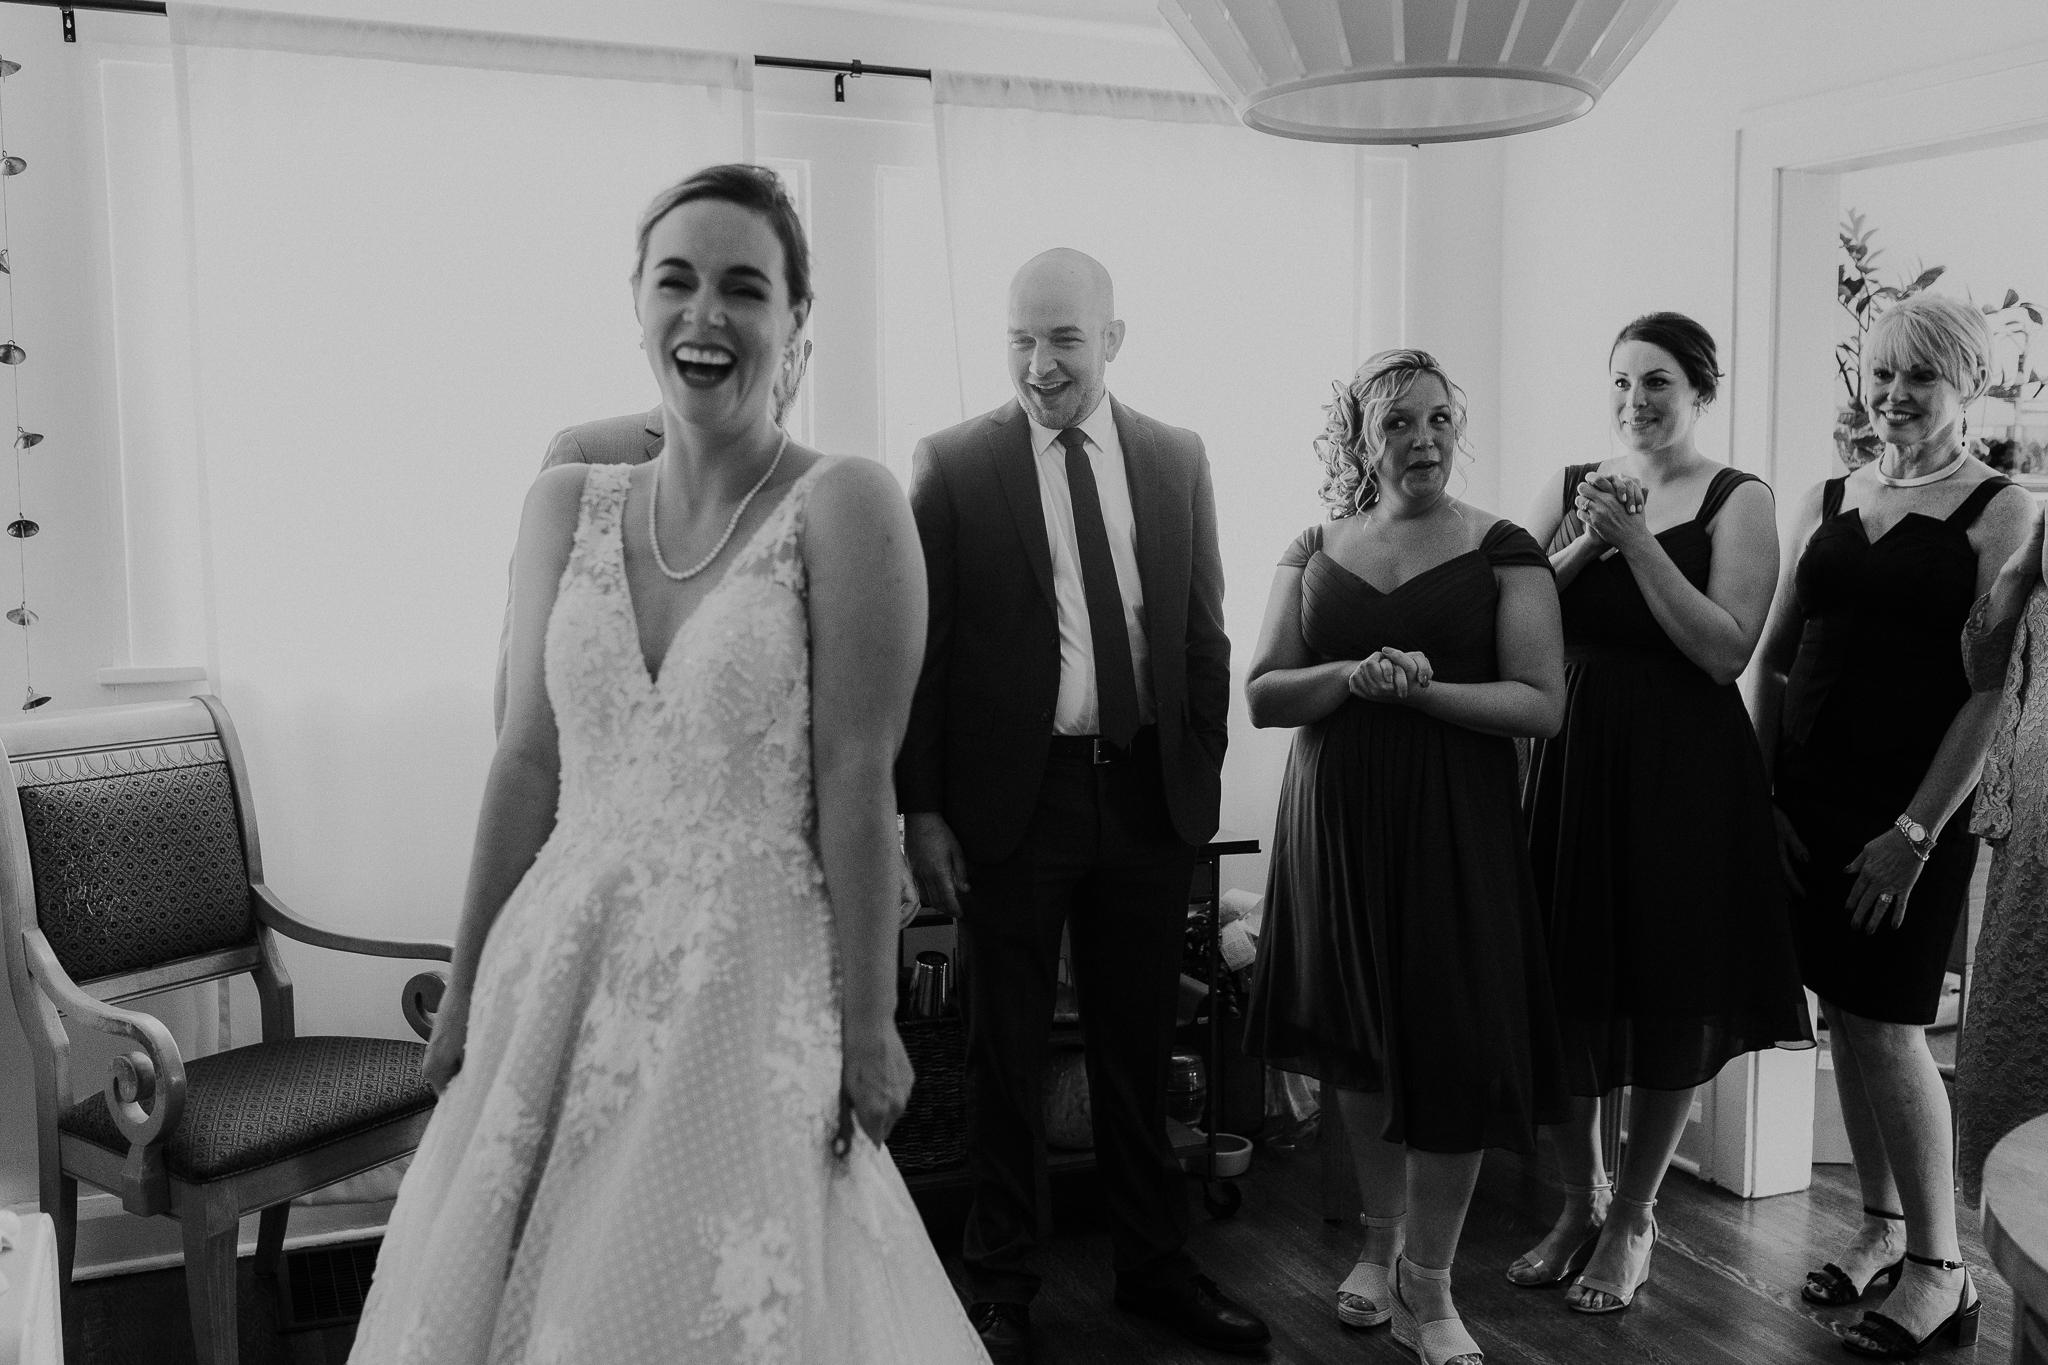 sheffwedding-67.JPG